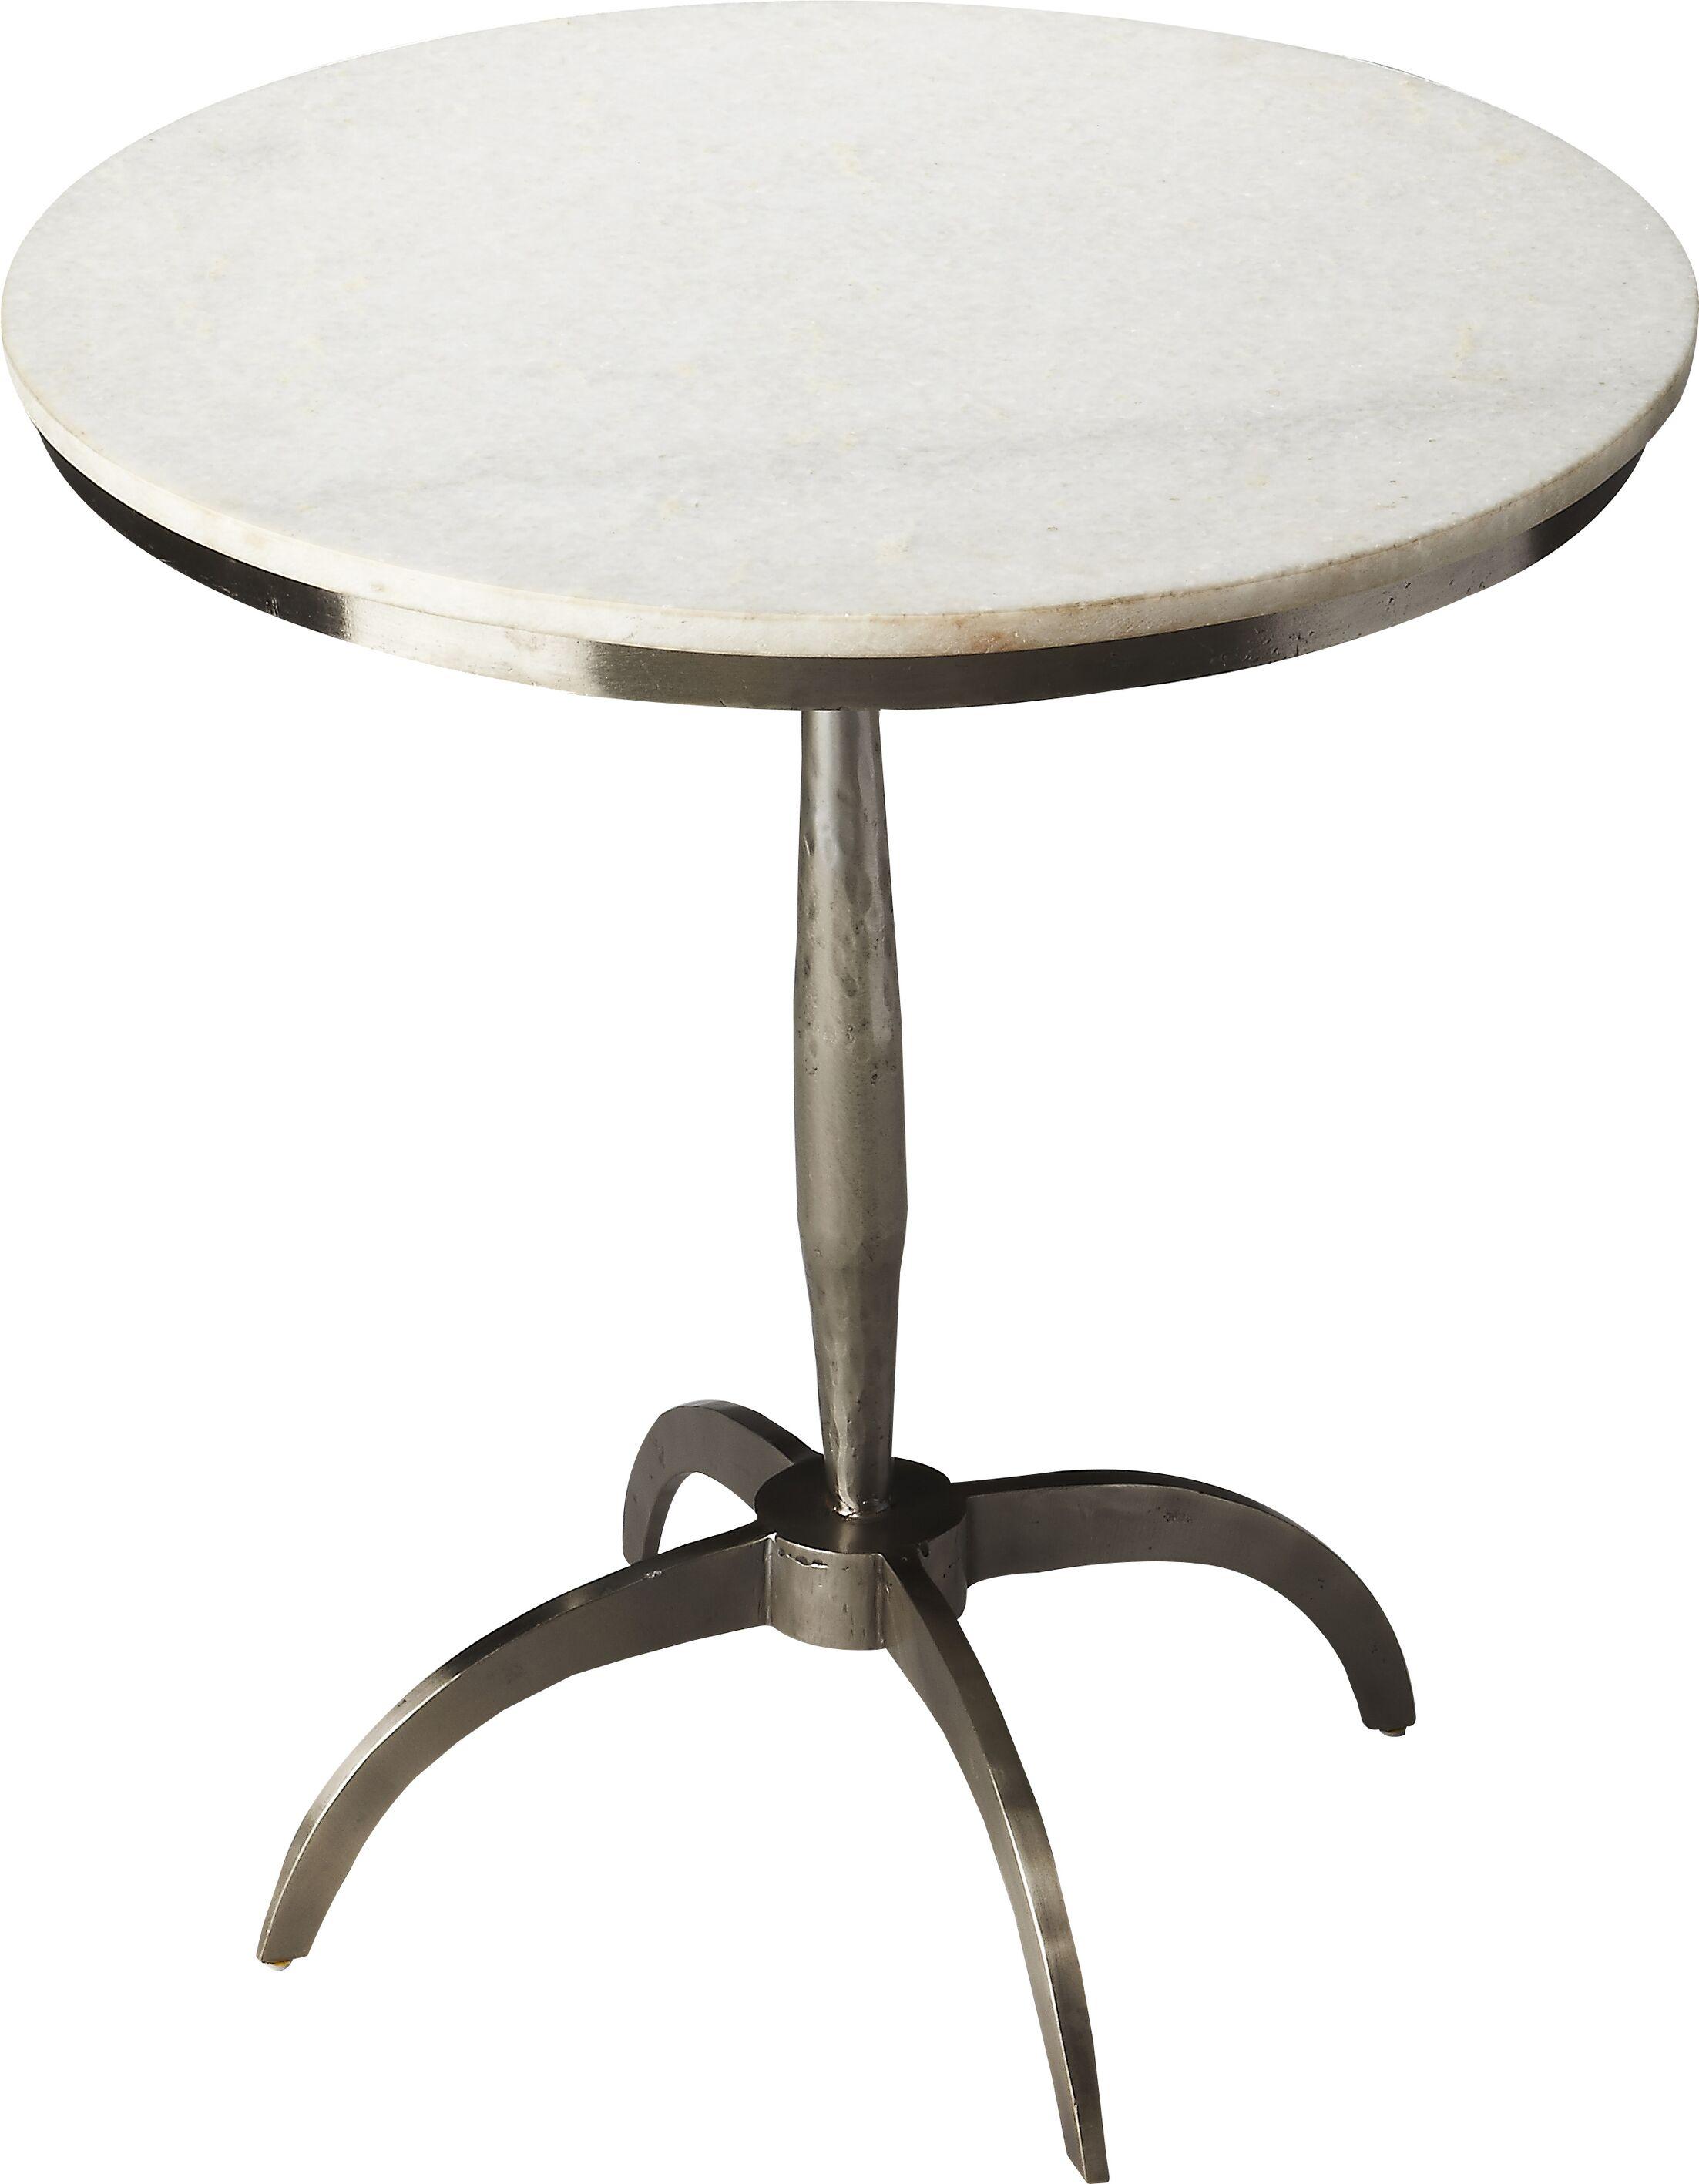 Rhiannon End Table